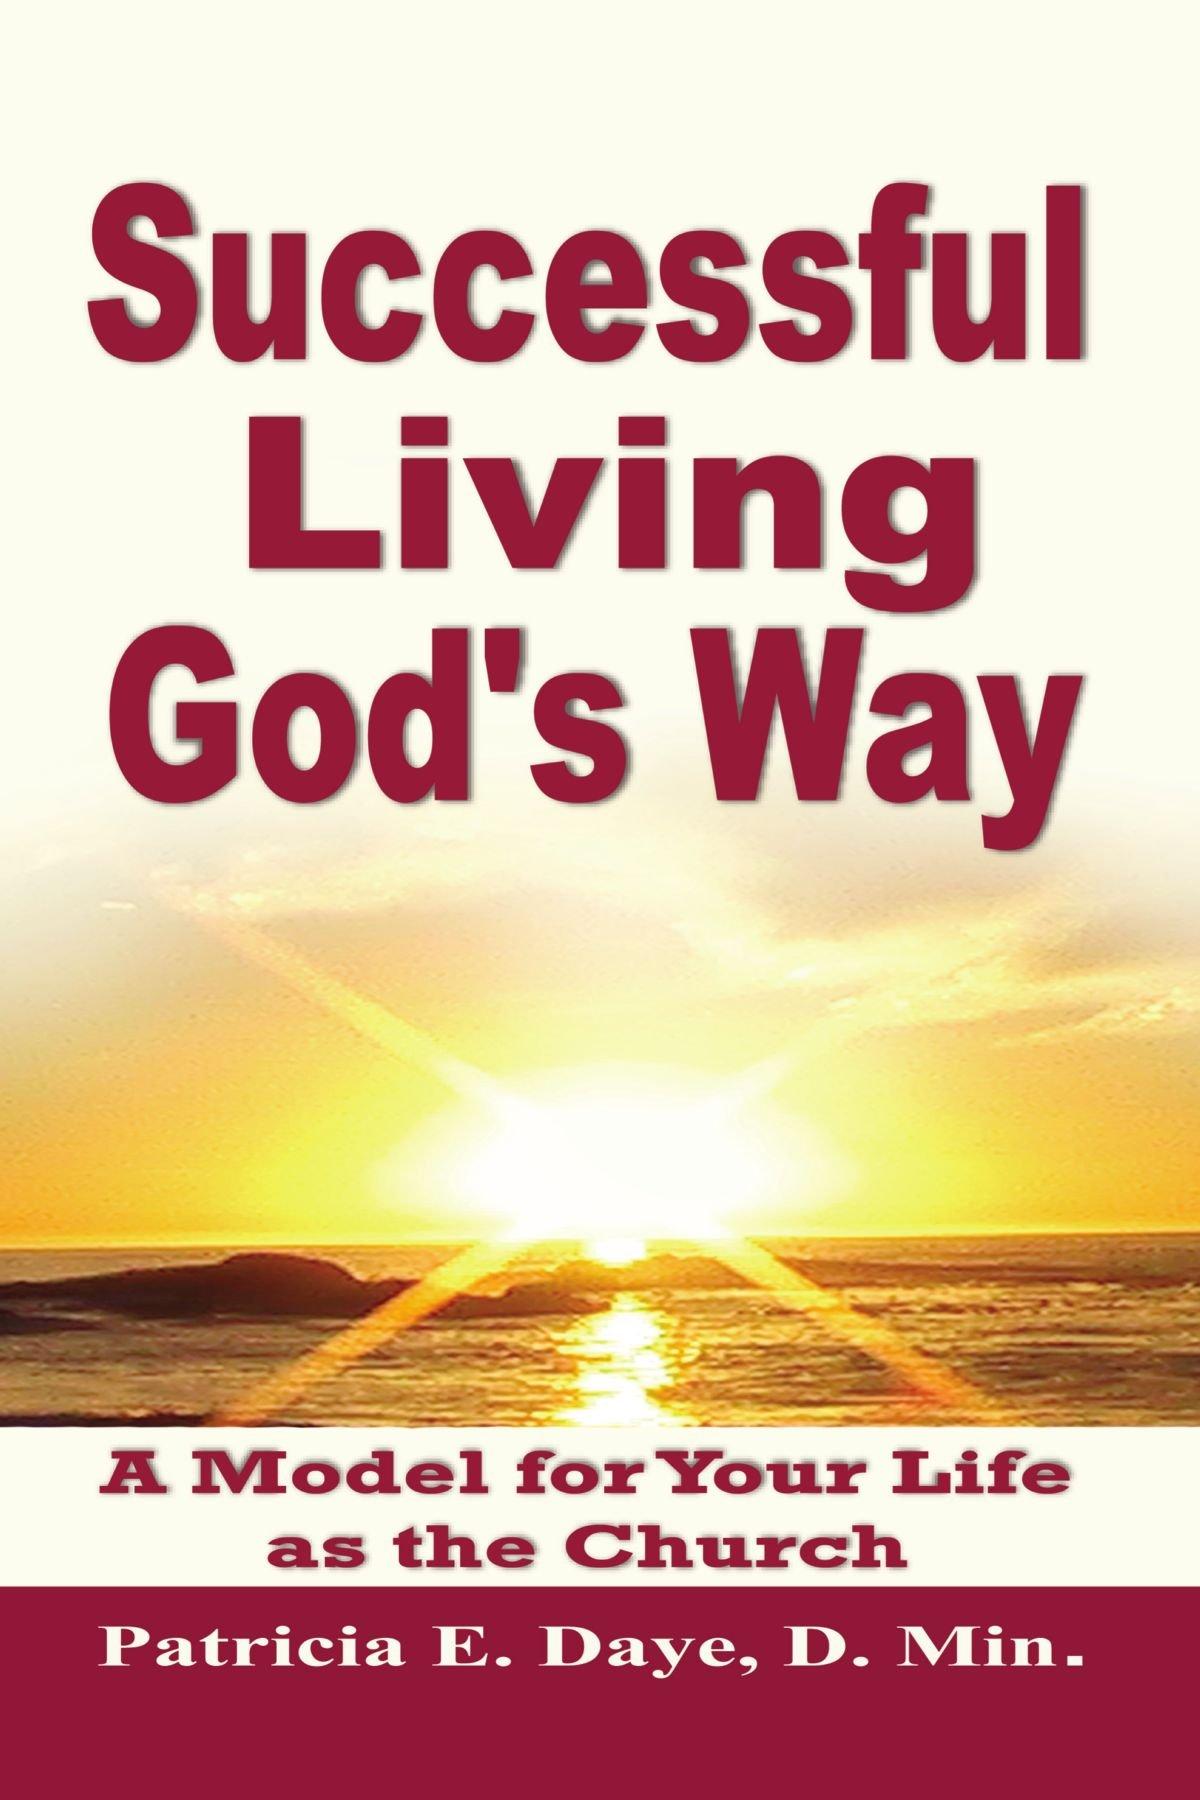 Successful Living Gods Way